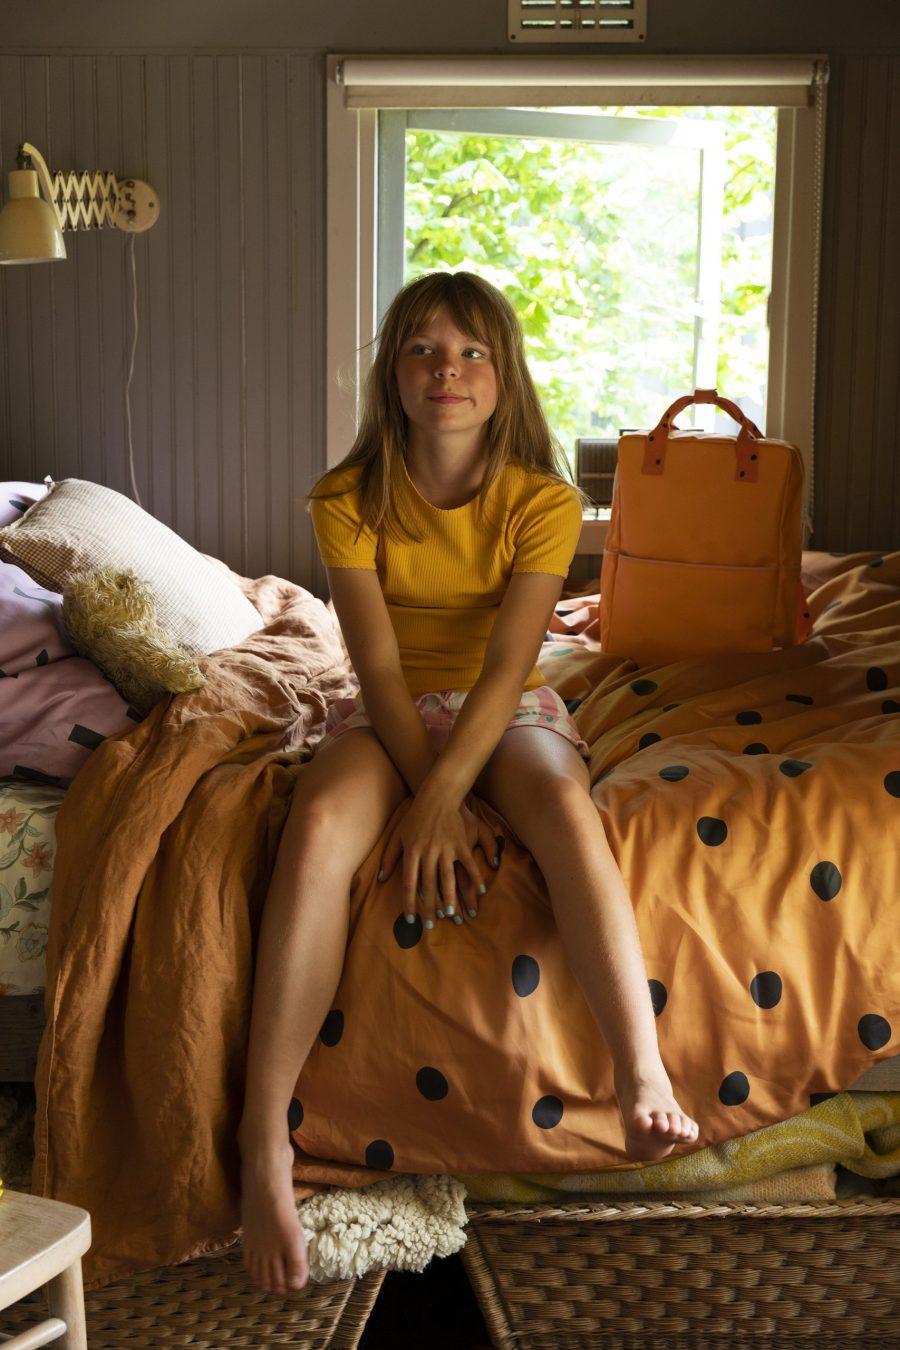 1801644 – Sticky Lemon – backpack large – freckles – sunny yellow + carrot orange – style shot 0 (1)